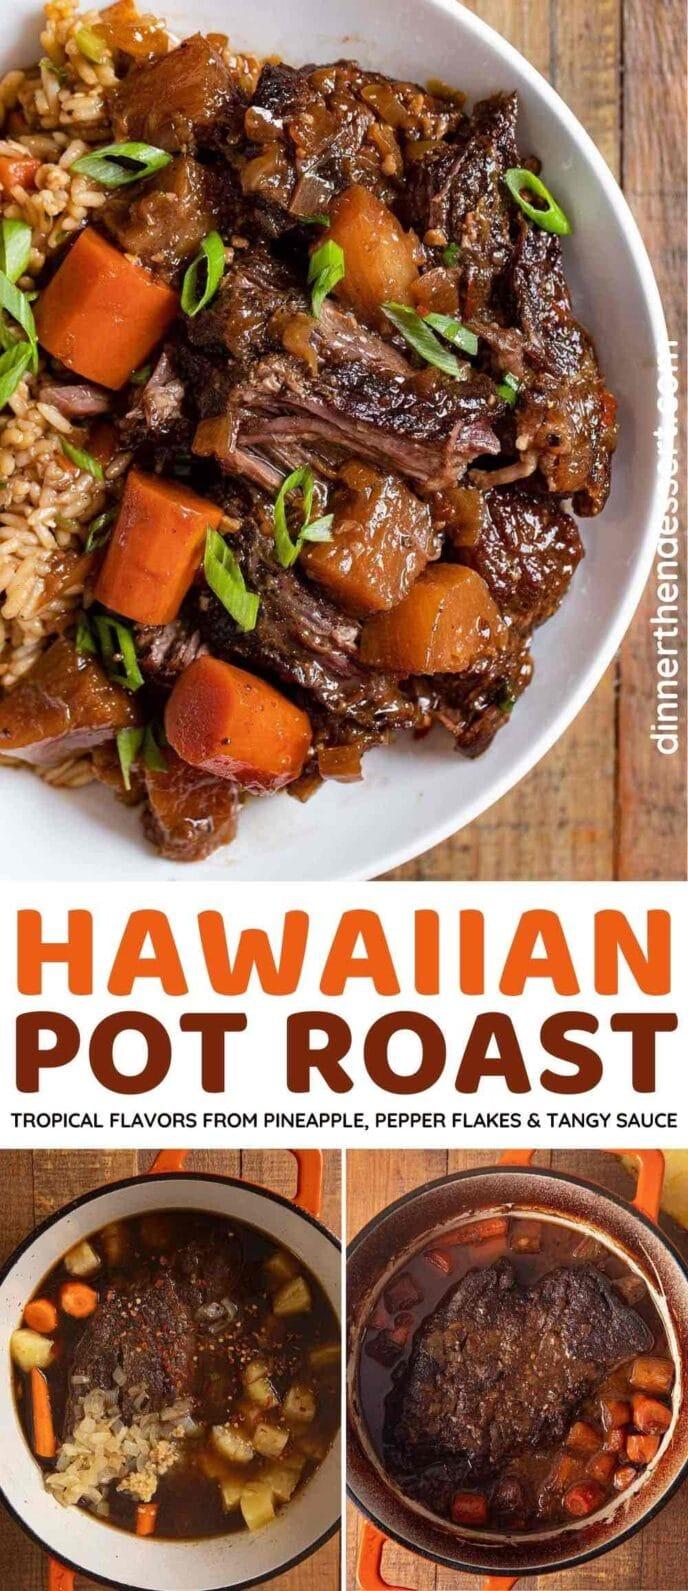 Hawaiian Pot Roast collage